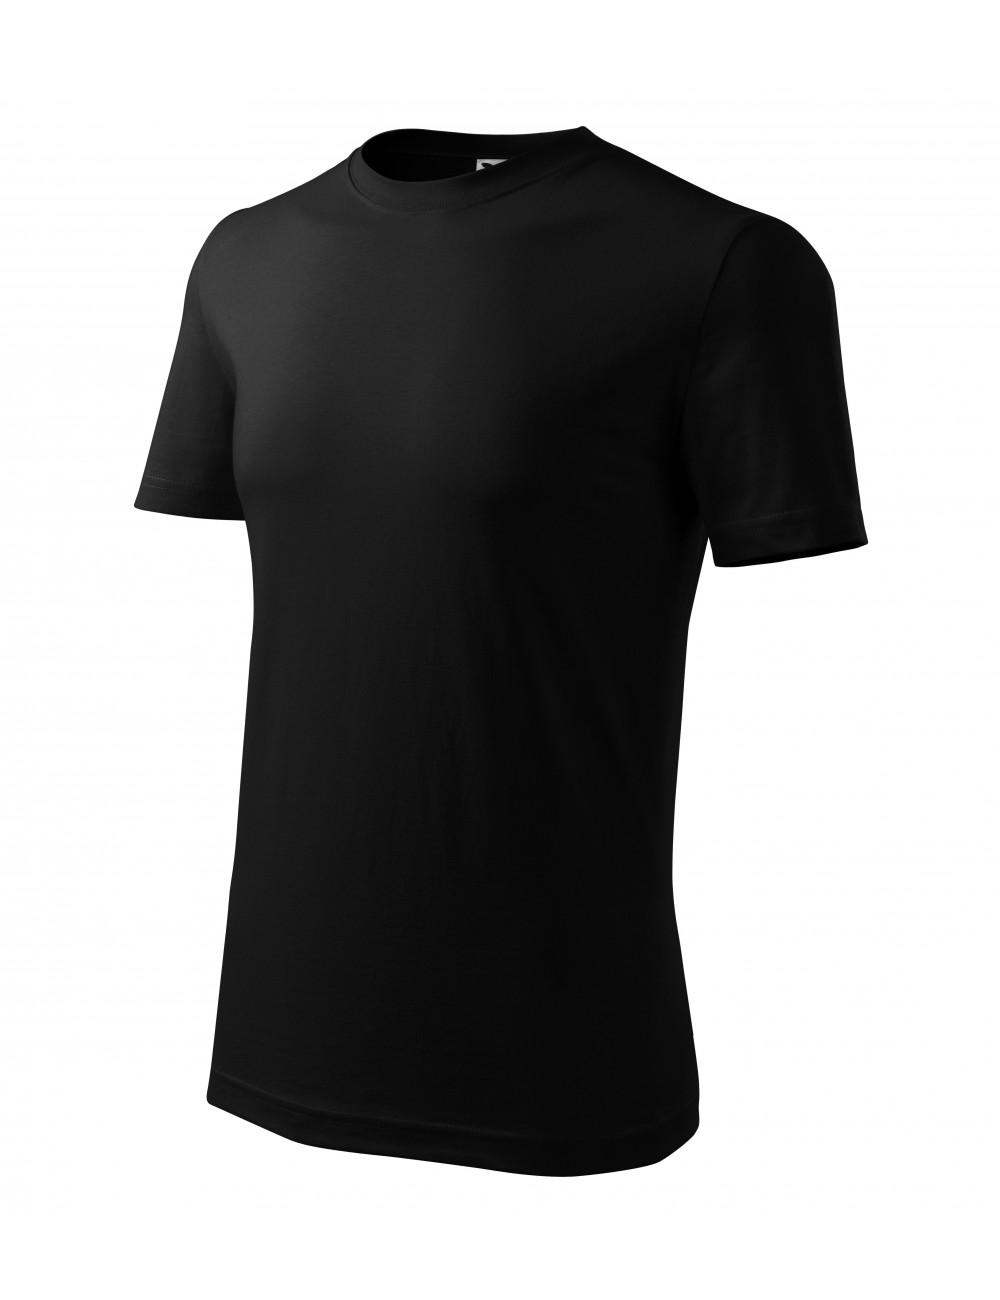 Adler MALFINI Koszulka męska Classic New 132 czarny